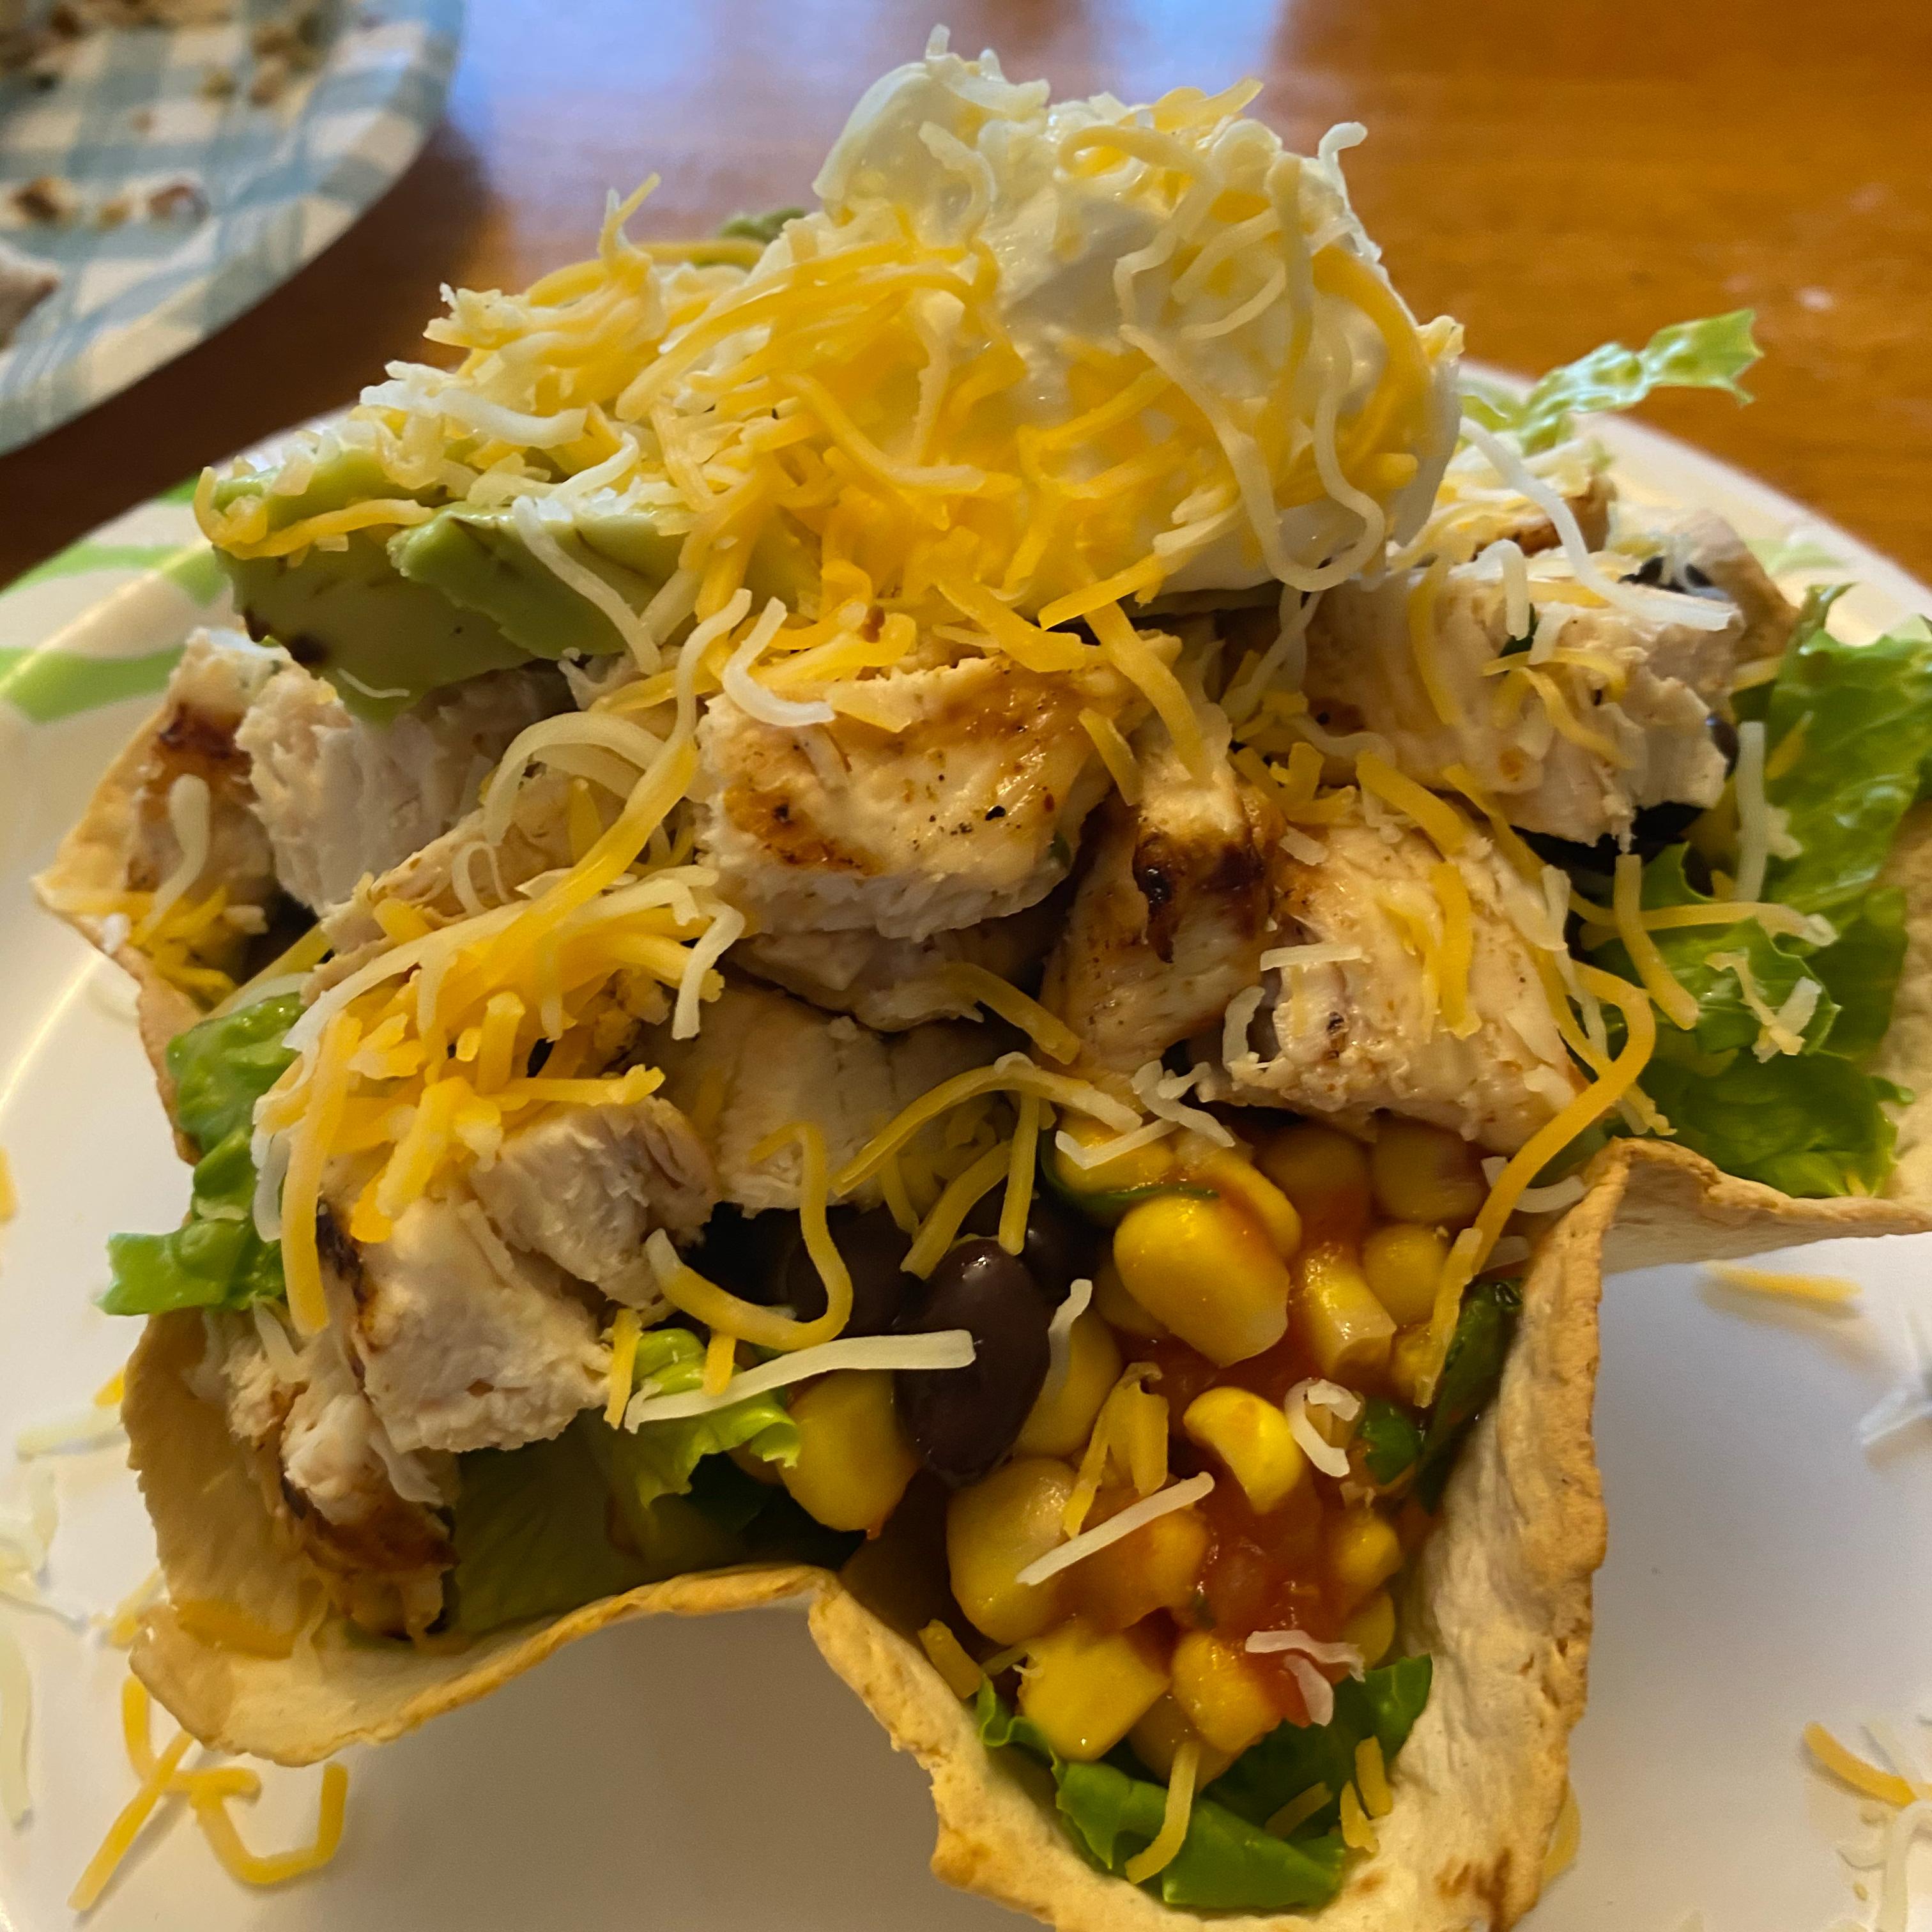 Grilled Chicken Taco Salad